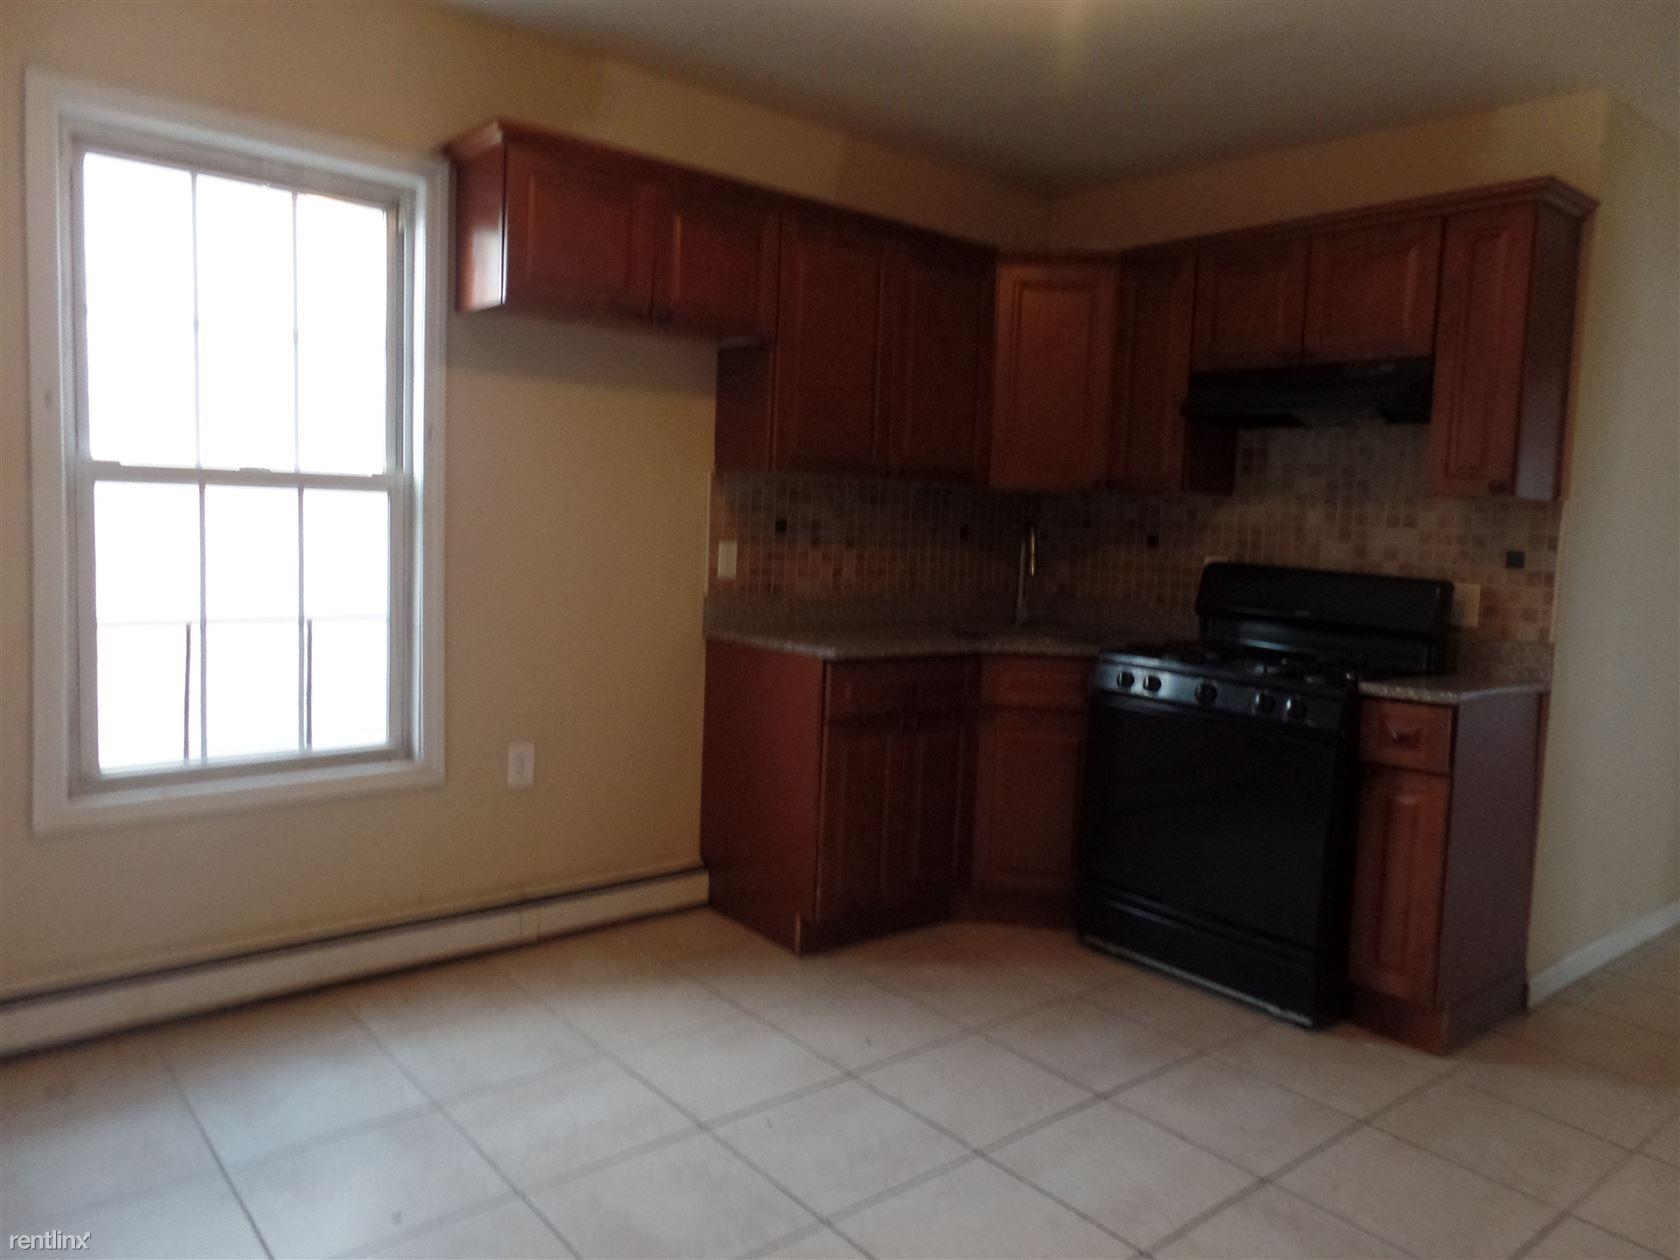 38 N 8th St Hawthorne Nj 07506 3 Bedroom Apartment For Rent Padmapper